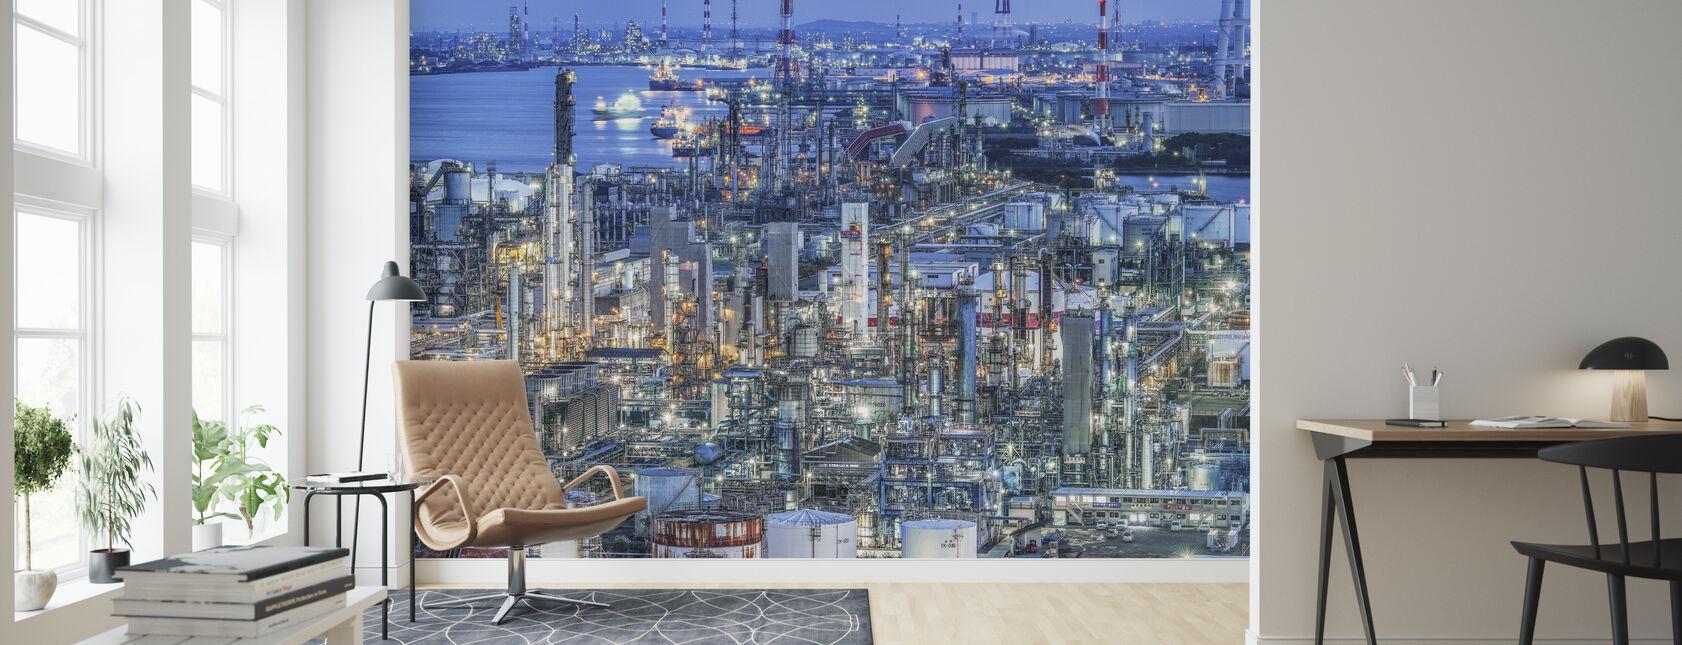 Coastal Industrial Area - Wallpaper - Living Room